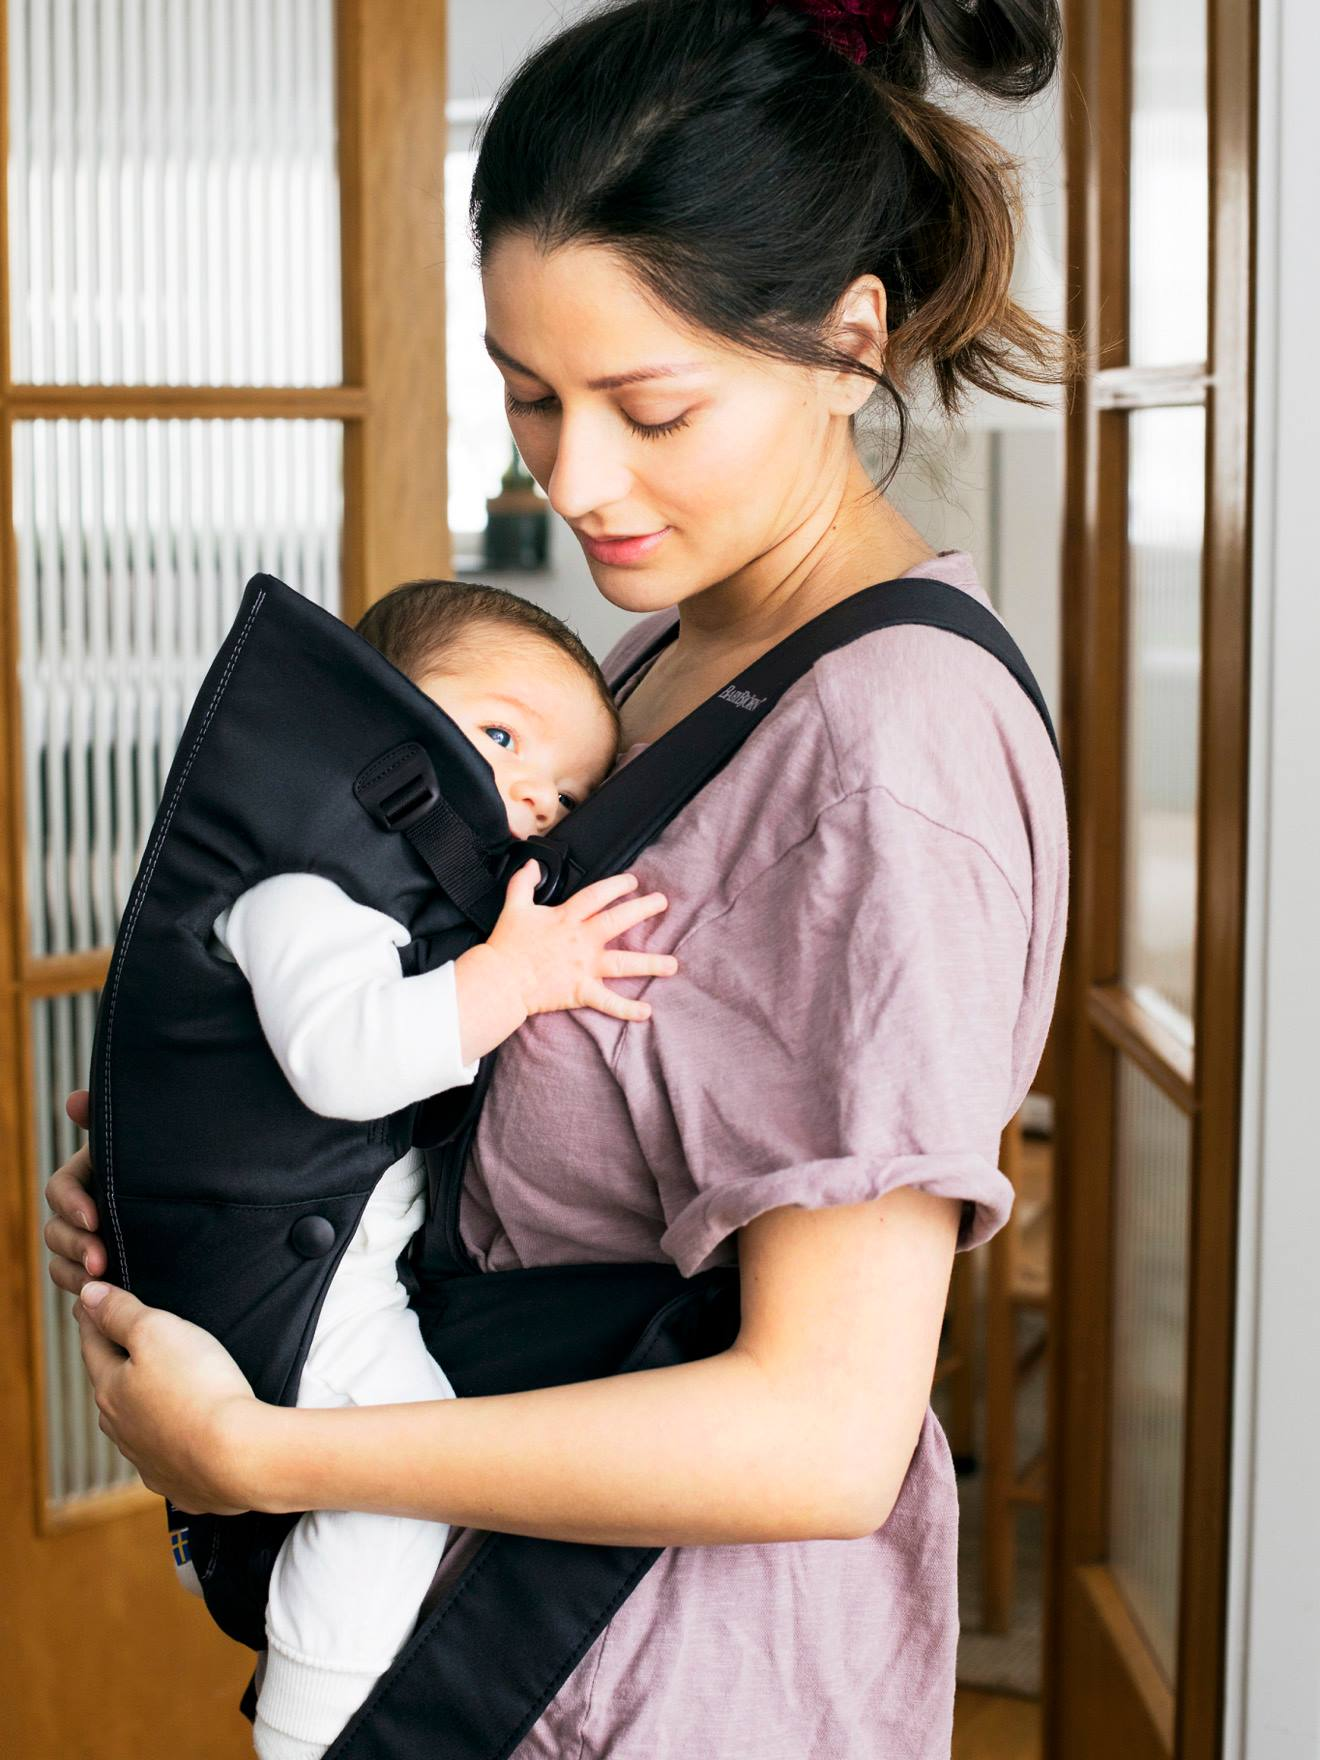 Porte-bébé Mini BABYBJORN noir - Baby bjorn 6ebd1ff2741